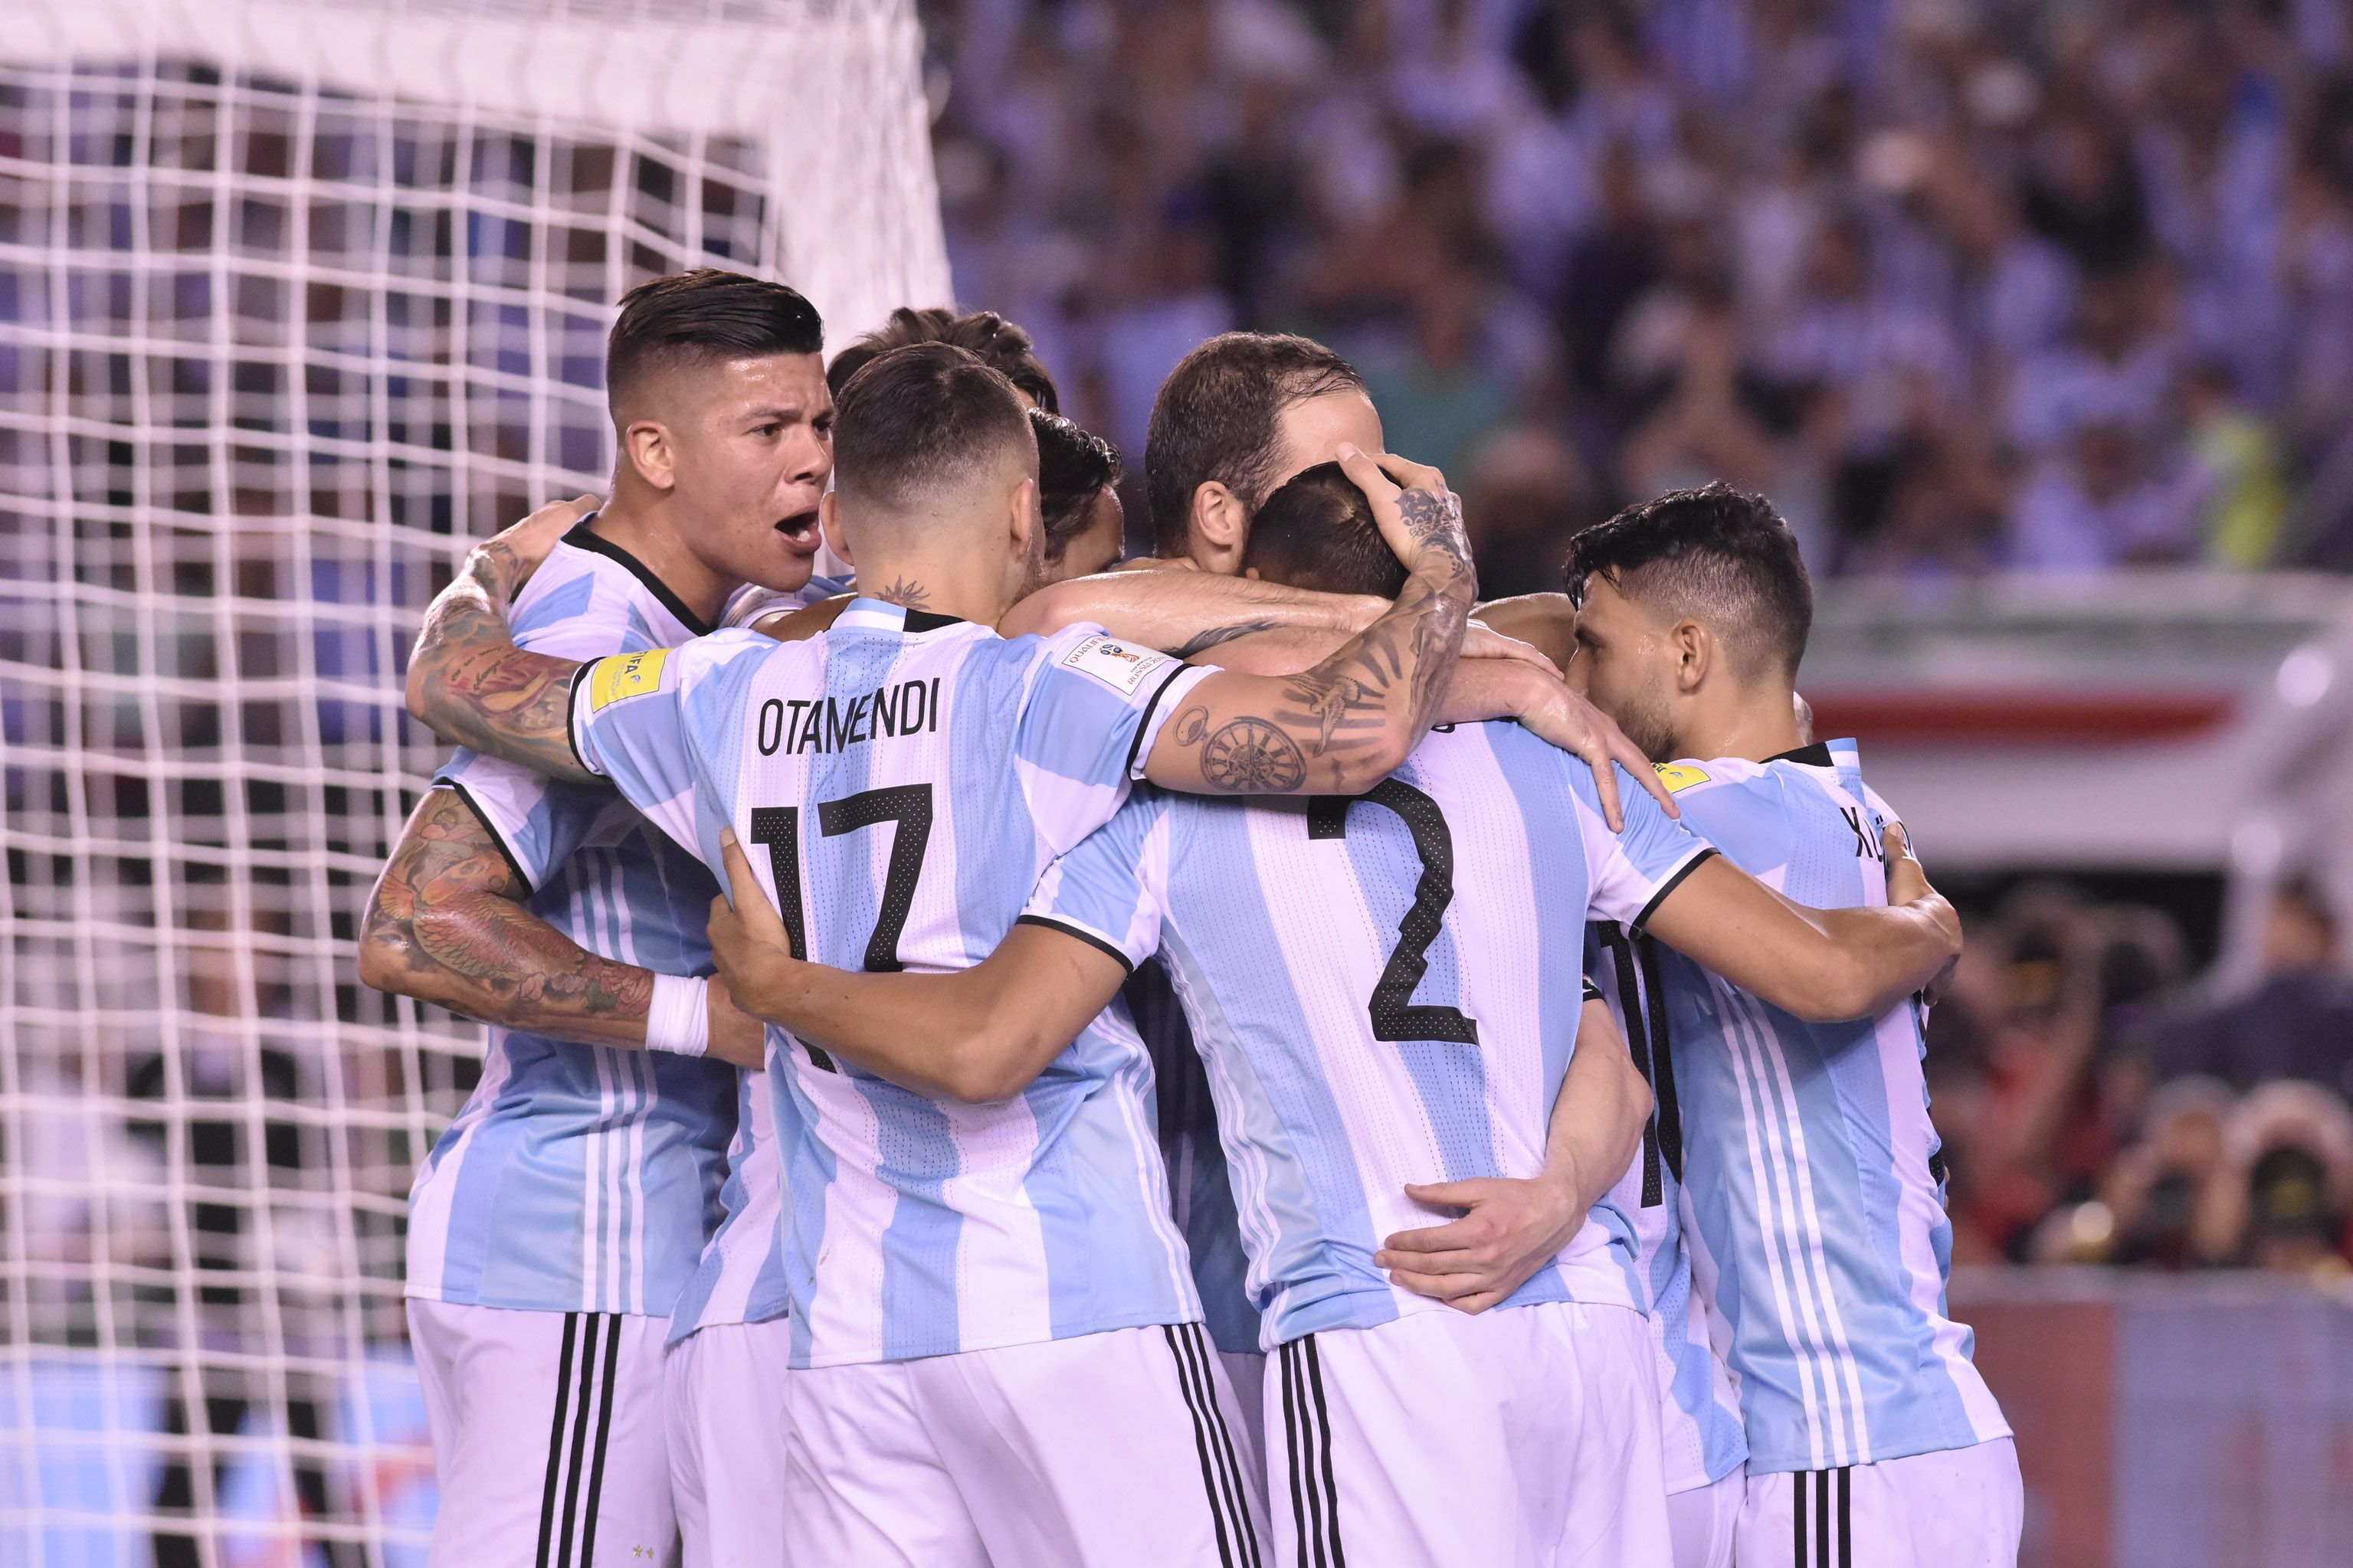 Sin jugar bien, Argentina derrotó a Chile con un gol de Messi de penal